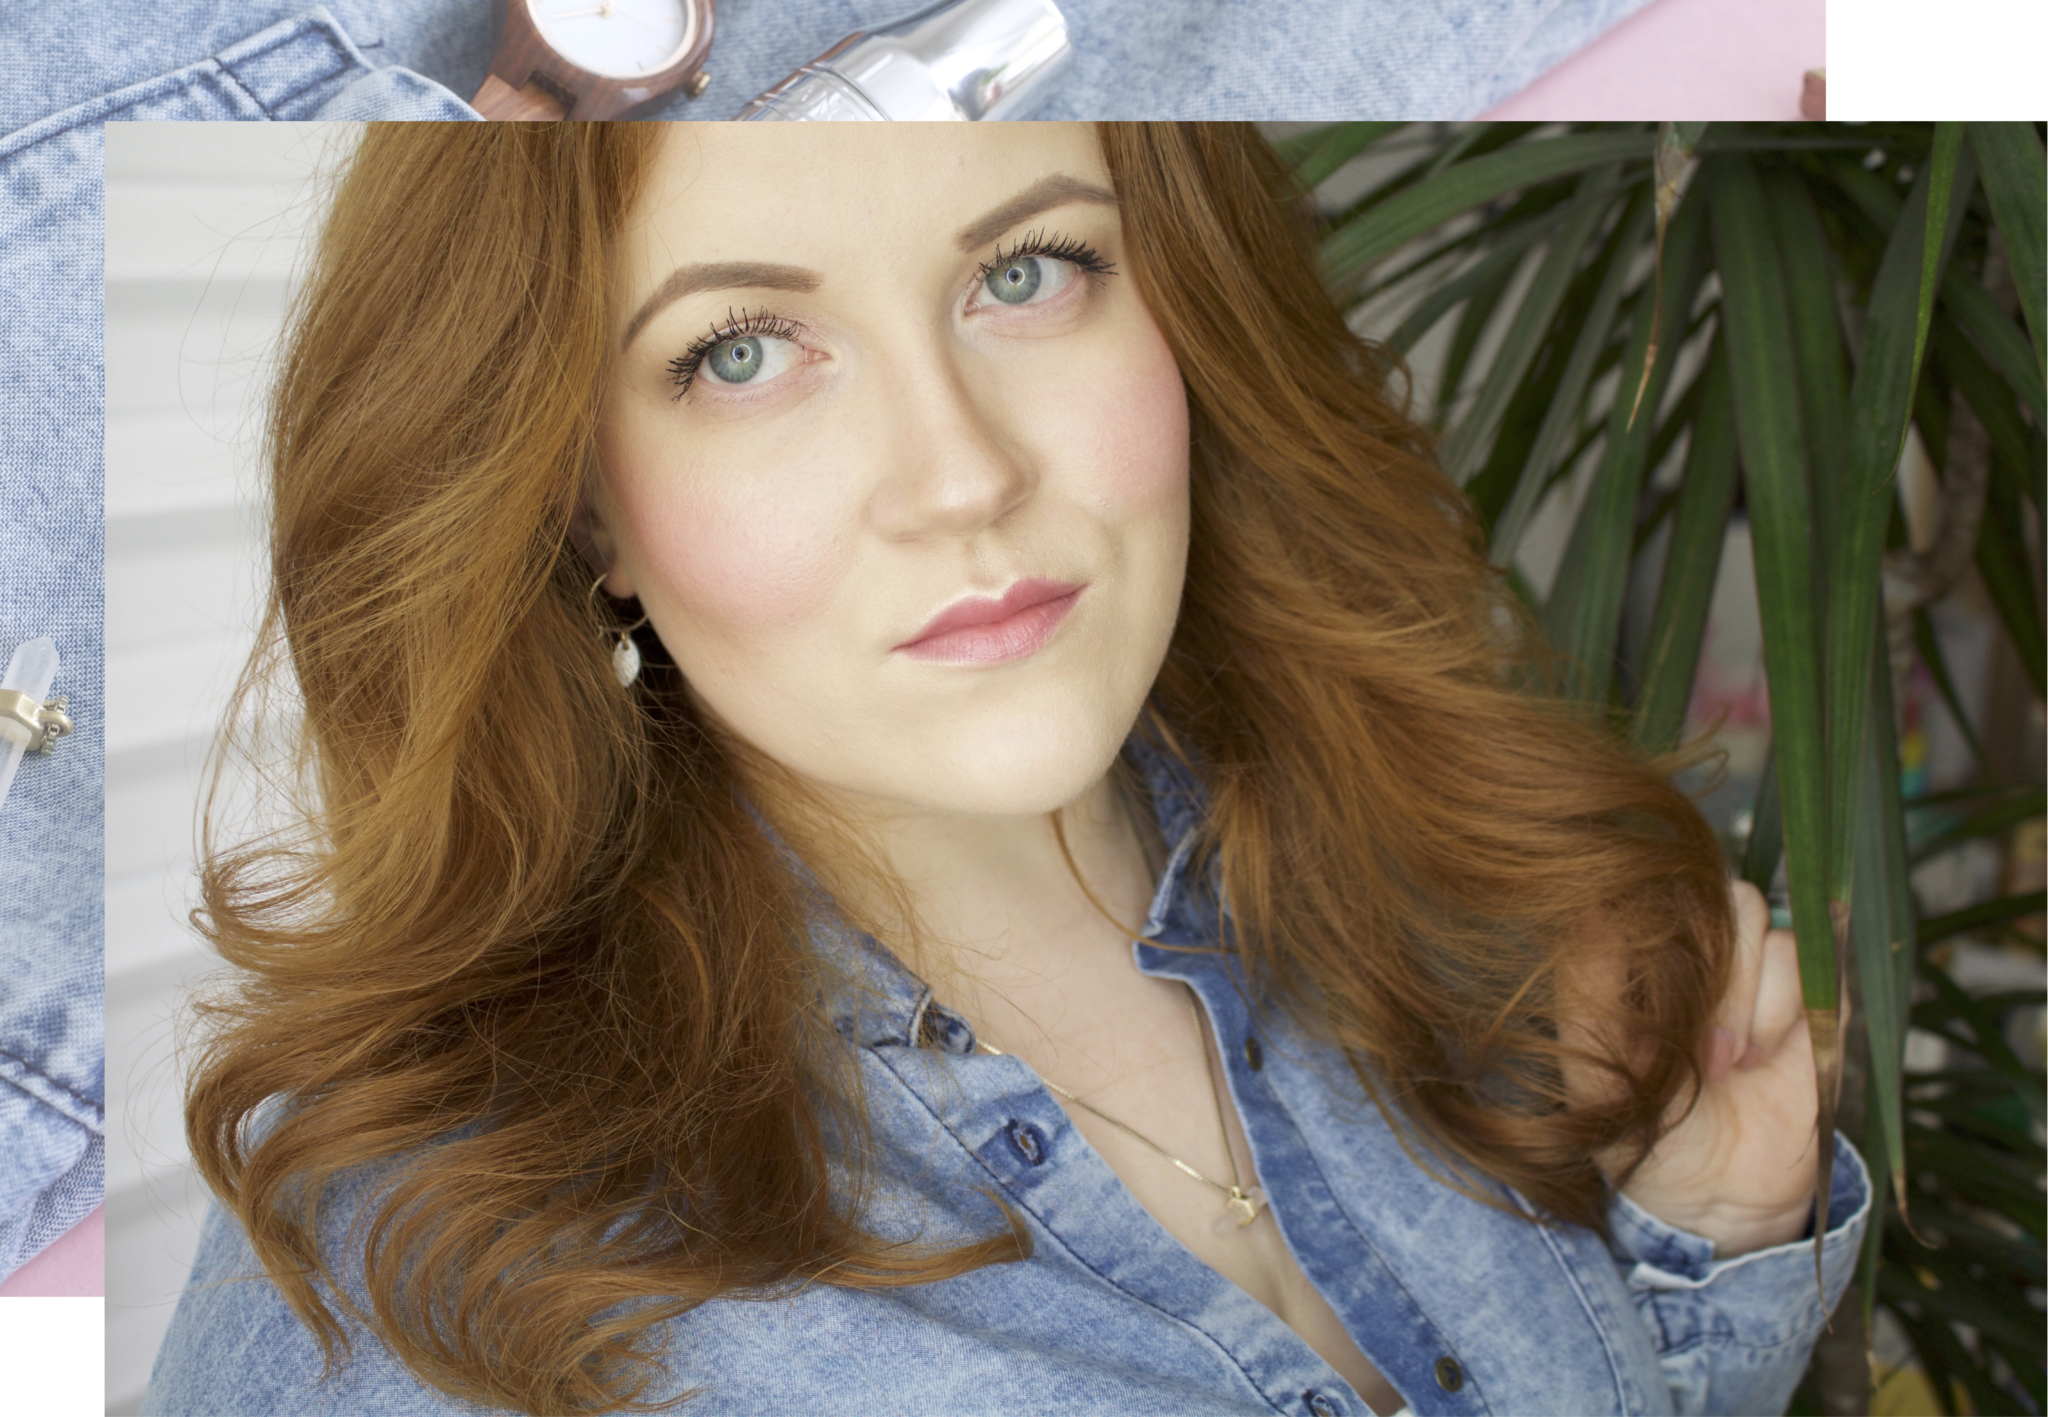 Titelbild: Mein Oster Make-up Look: peach & glowy mit Lancome & YSL - Beauty Blog Leipzig